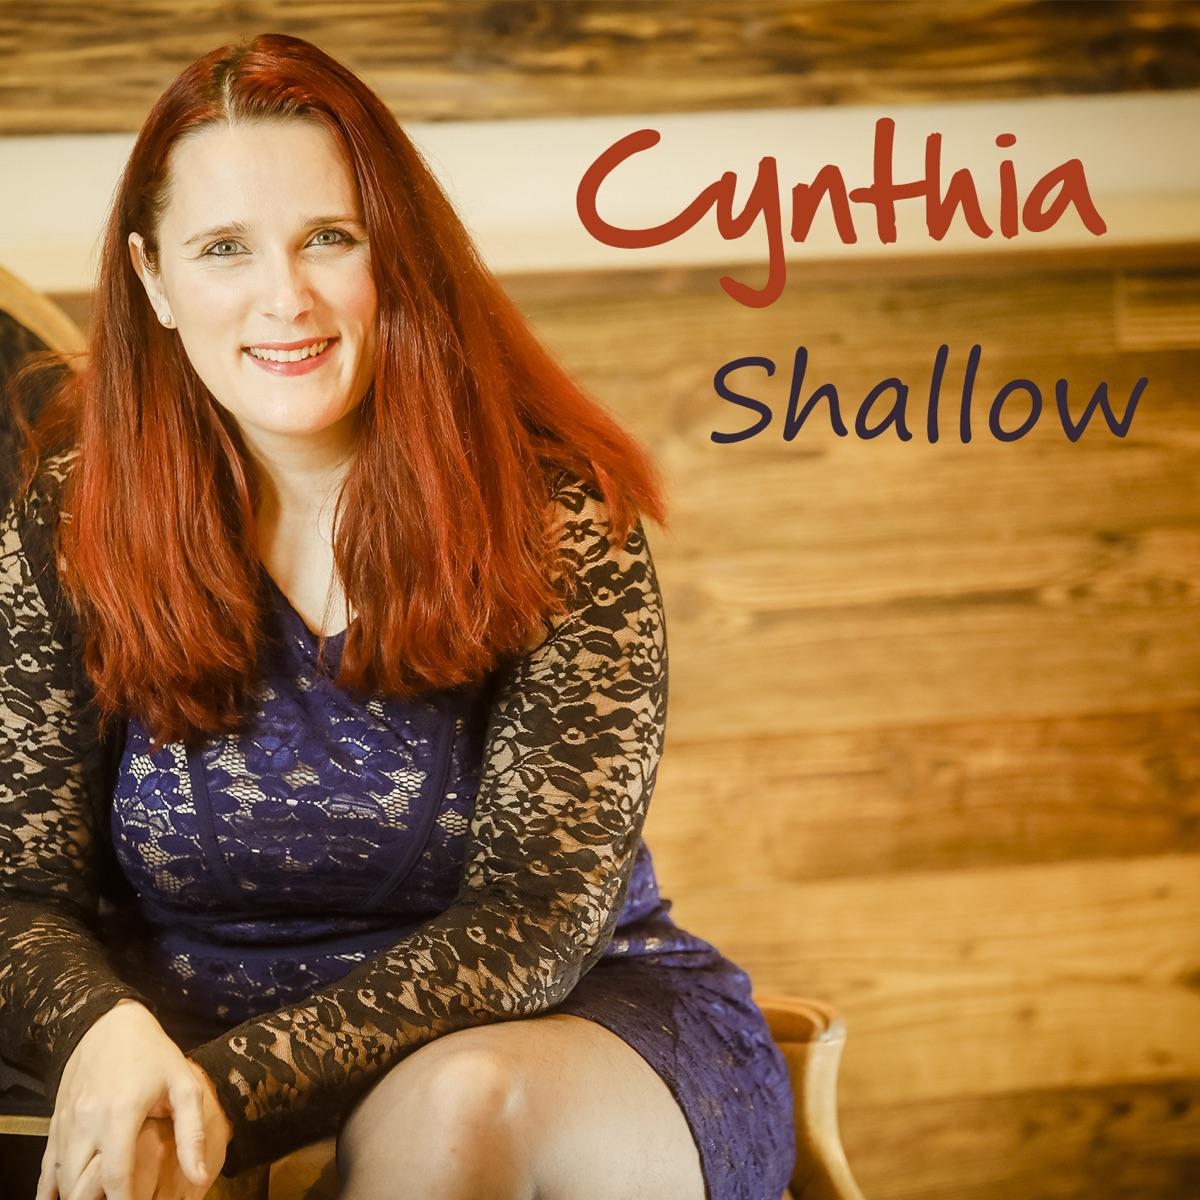 Shallow – A Star is Born - Lady Gaga - Single Cynthia Colombo CD cover